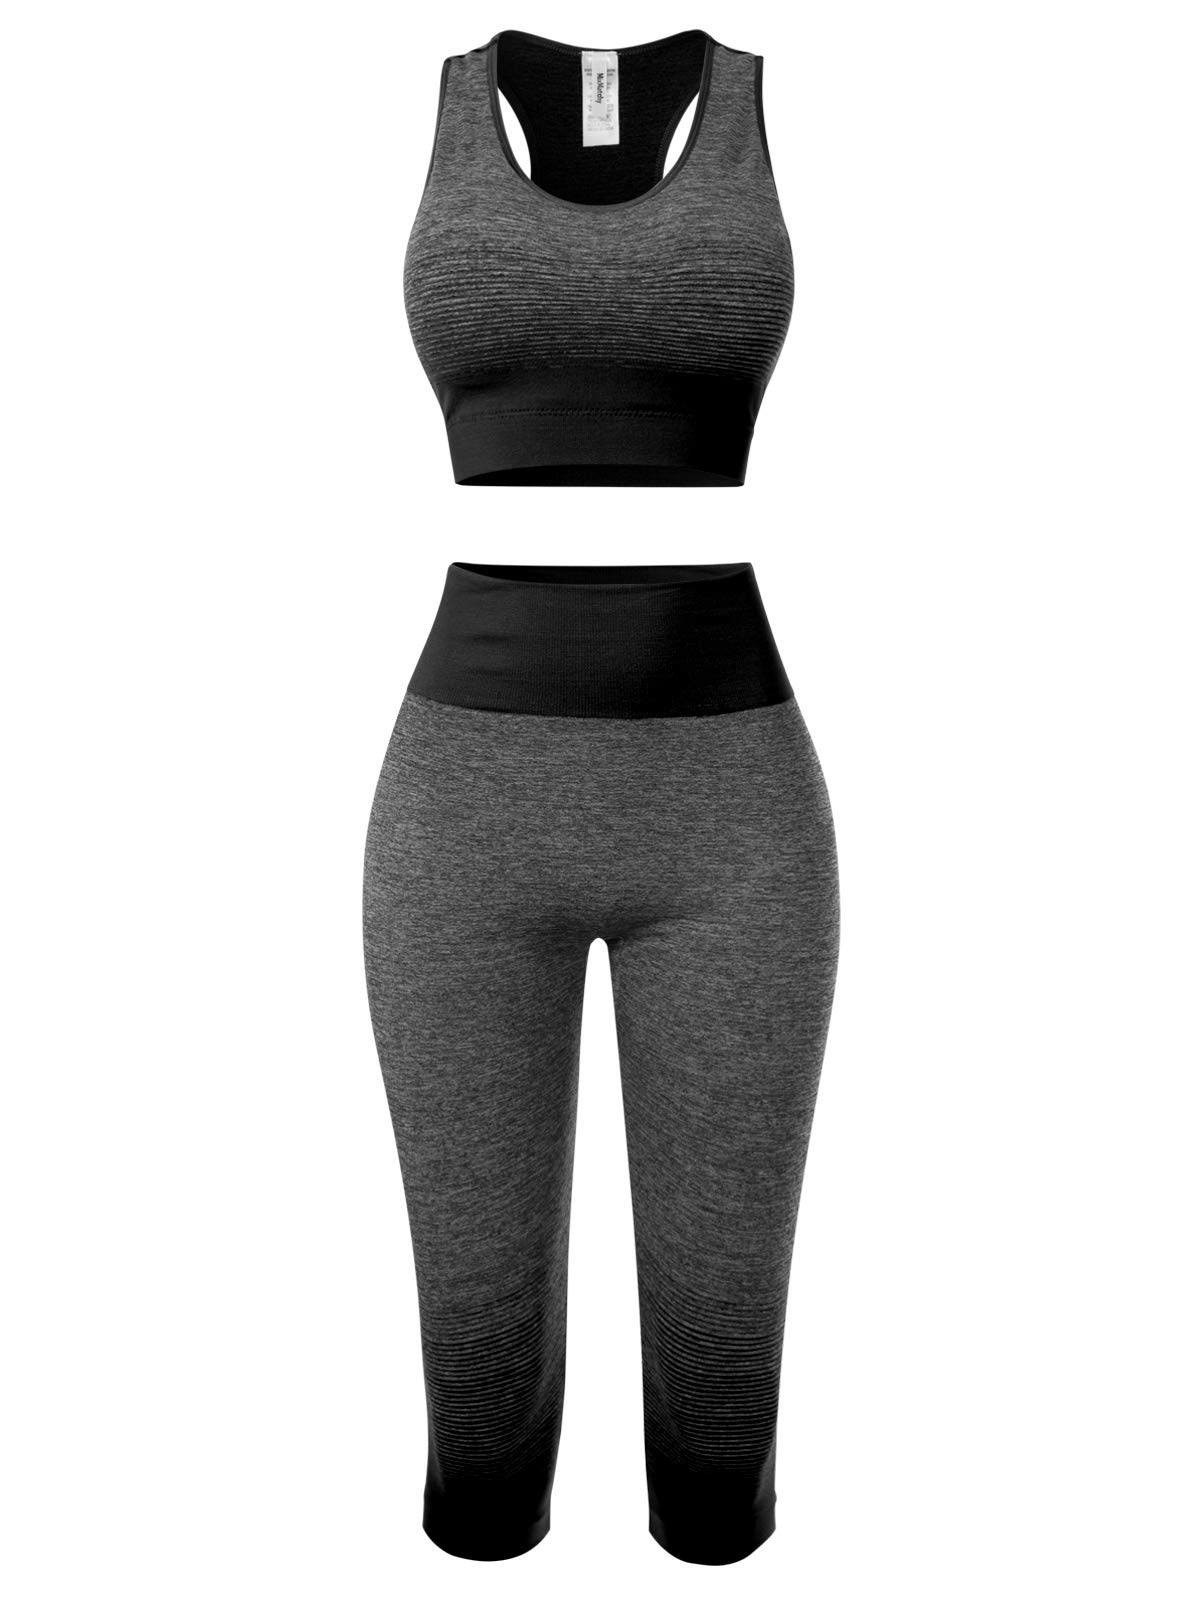 MixMatchy Women's Two-Piece Sports Bra + Capri Leggings Gym Yoga Wear Set Black ONE by MixMatchy